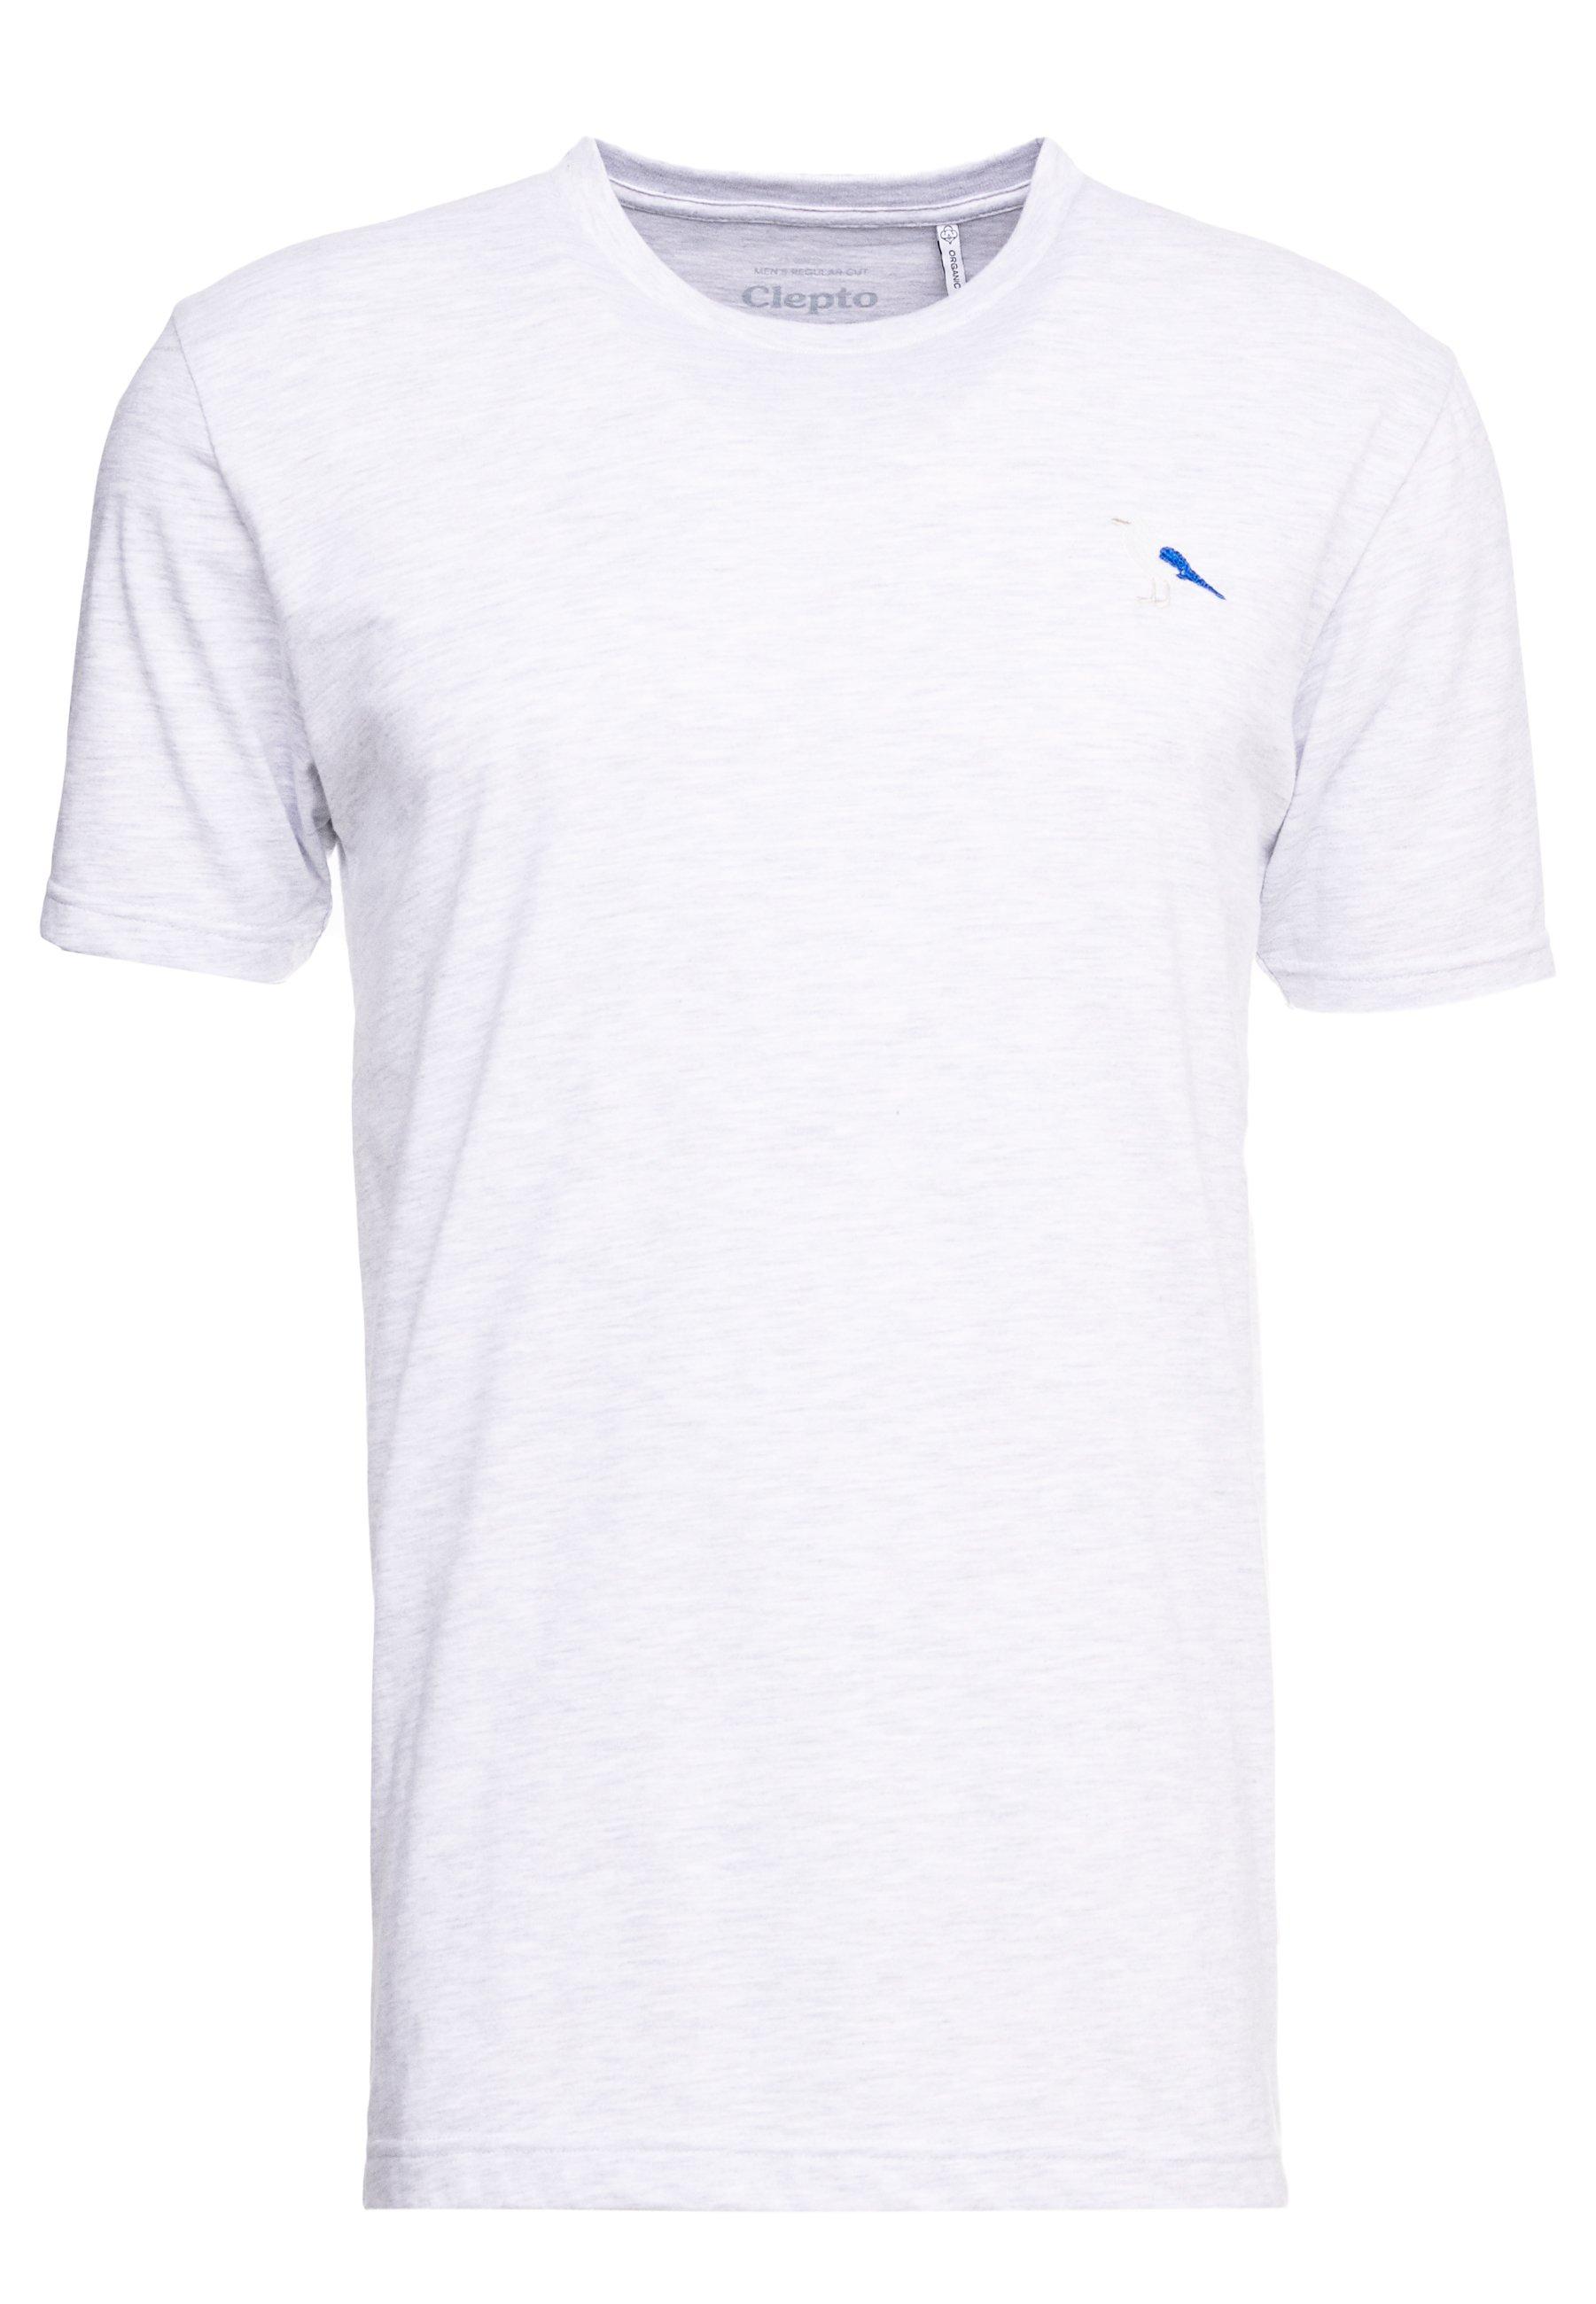 Cleptomanicx Embro Gull - T-shirt Basique Light Heather Gray